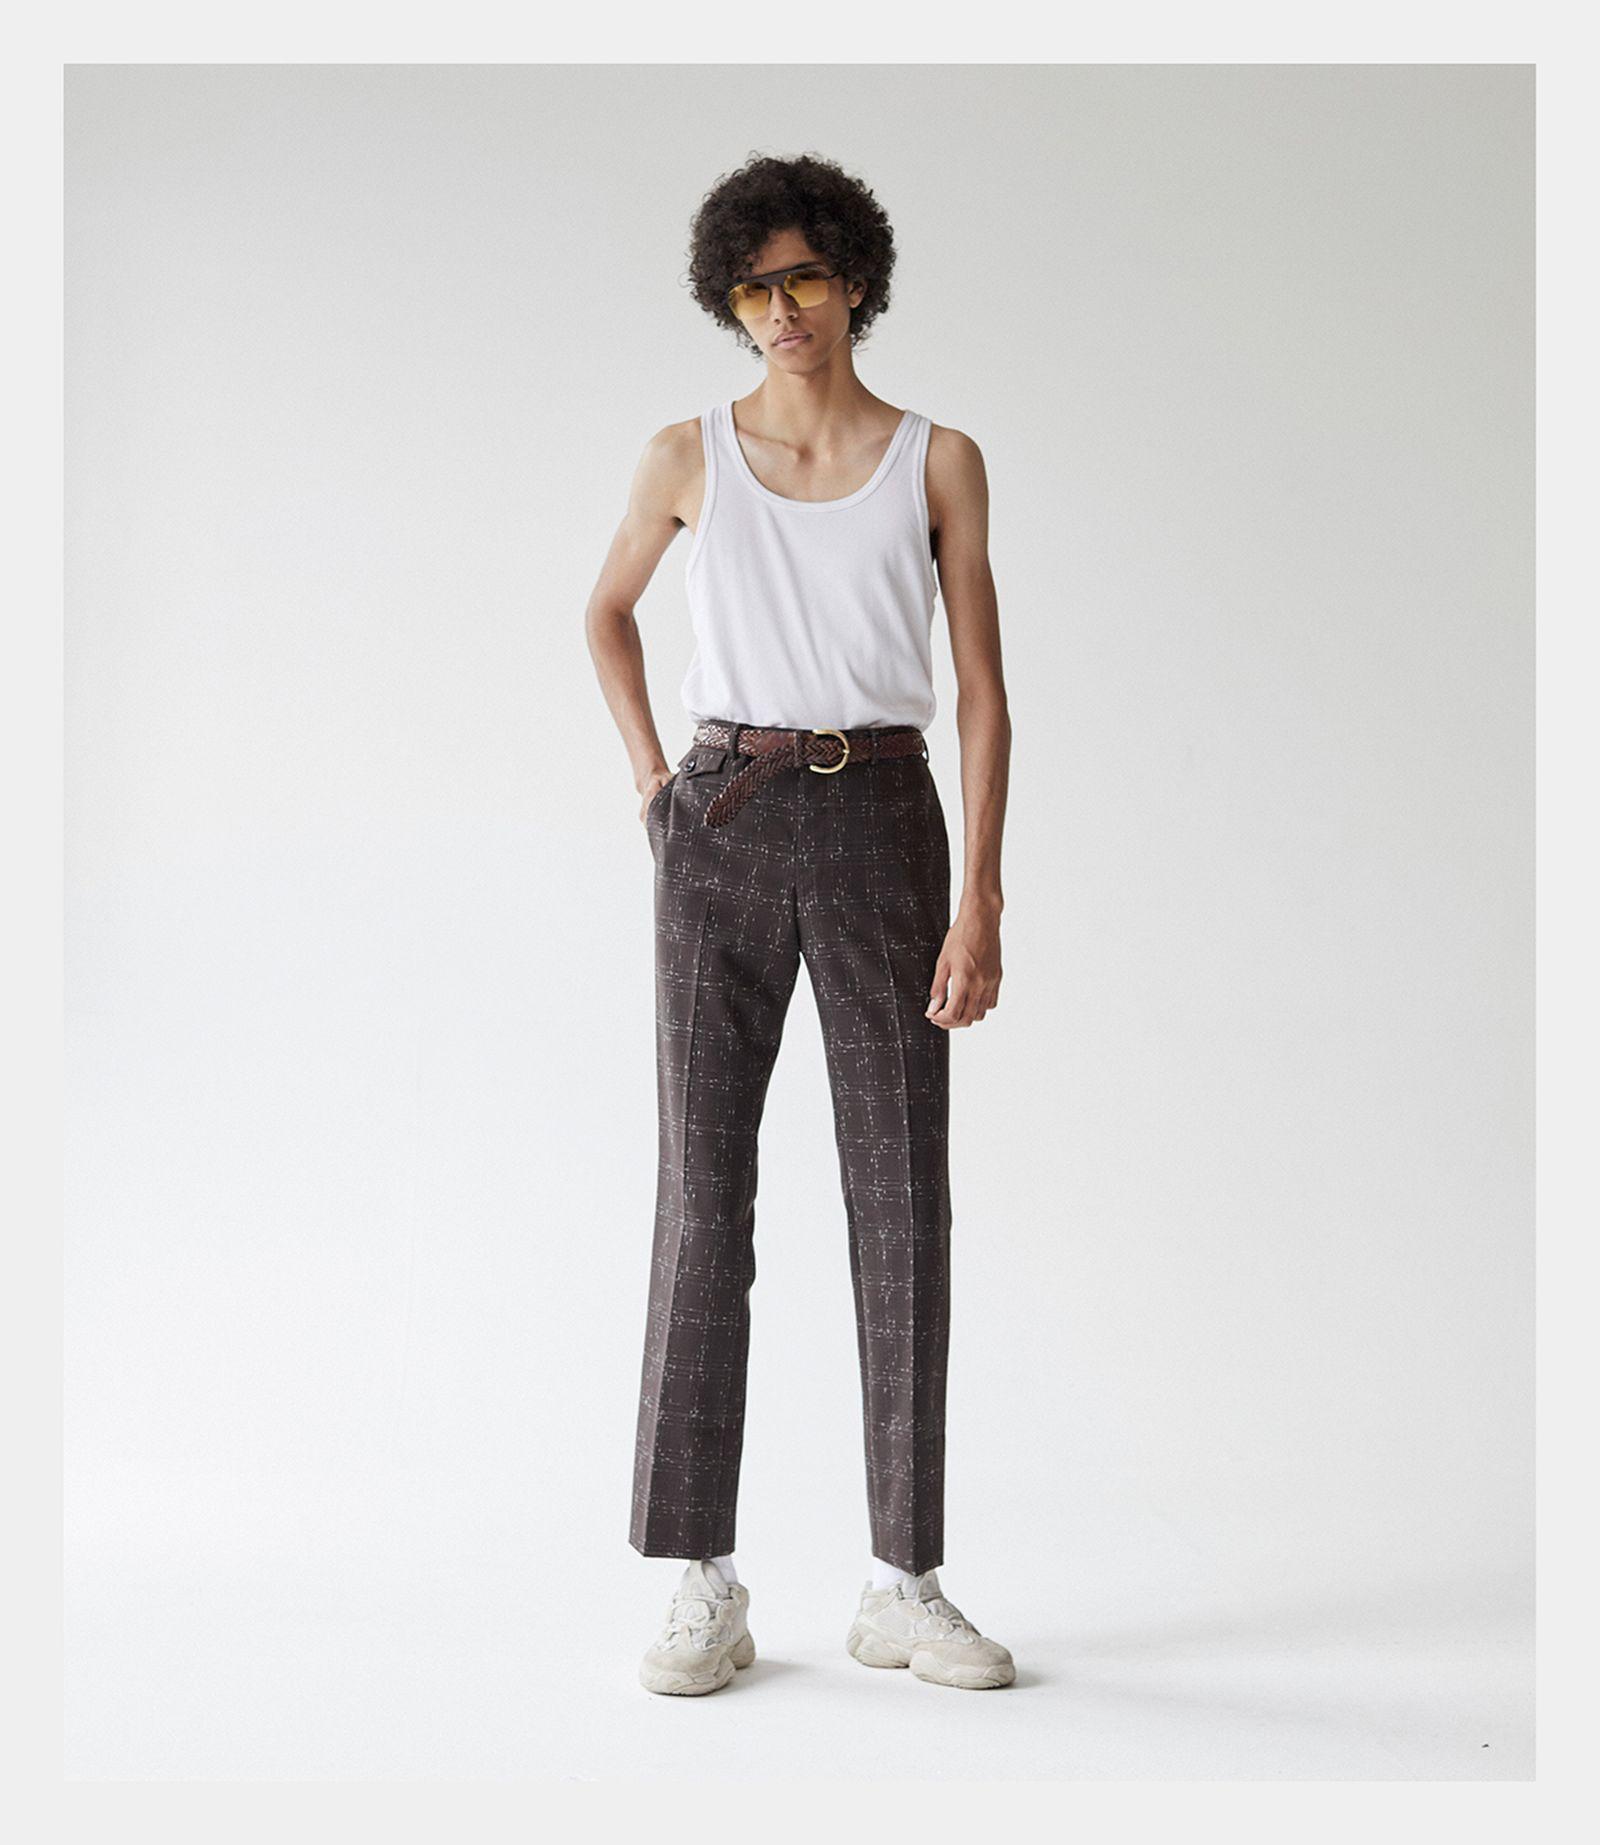 Vest: UNIQLO. Trouser:  JOHN LAWRENCE SULLIVAN. Sneakers: ADIDAS YEEZY DESERT RAT 500 BLUSH. Sunglasses: BELSTAFF Aviators.